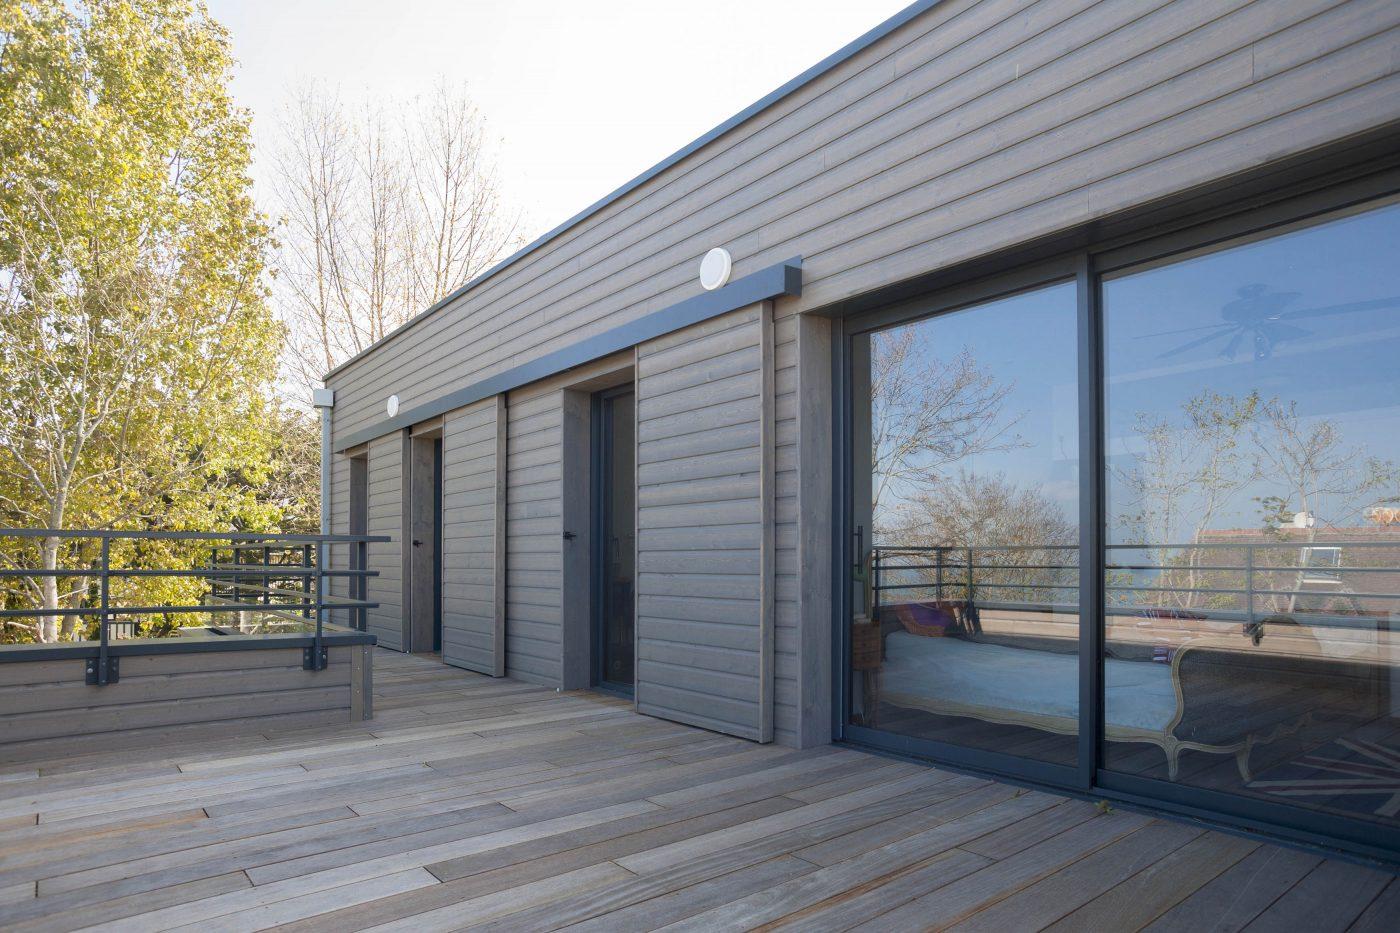 Philippe_Zerbib_Architecte_construction_maisons_ossature_bois_projet_maison_benhamou_MG_8469